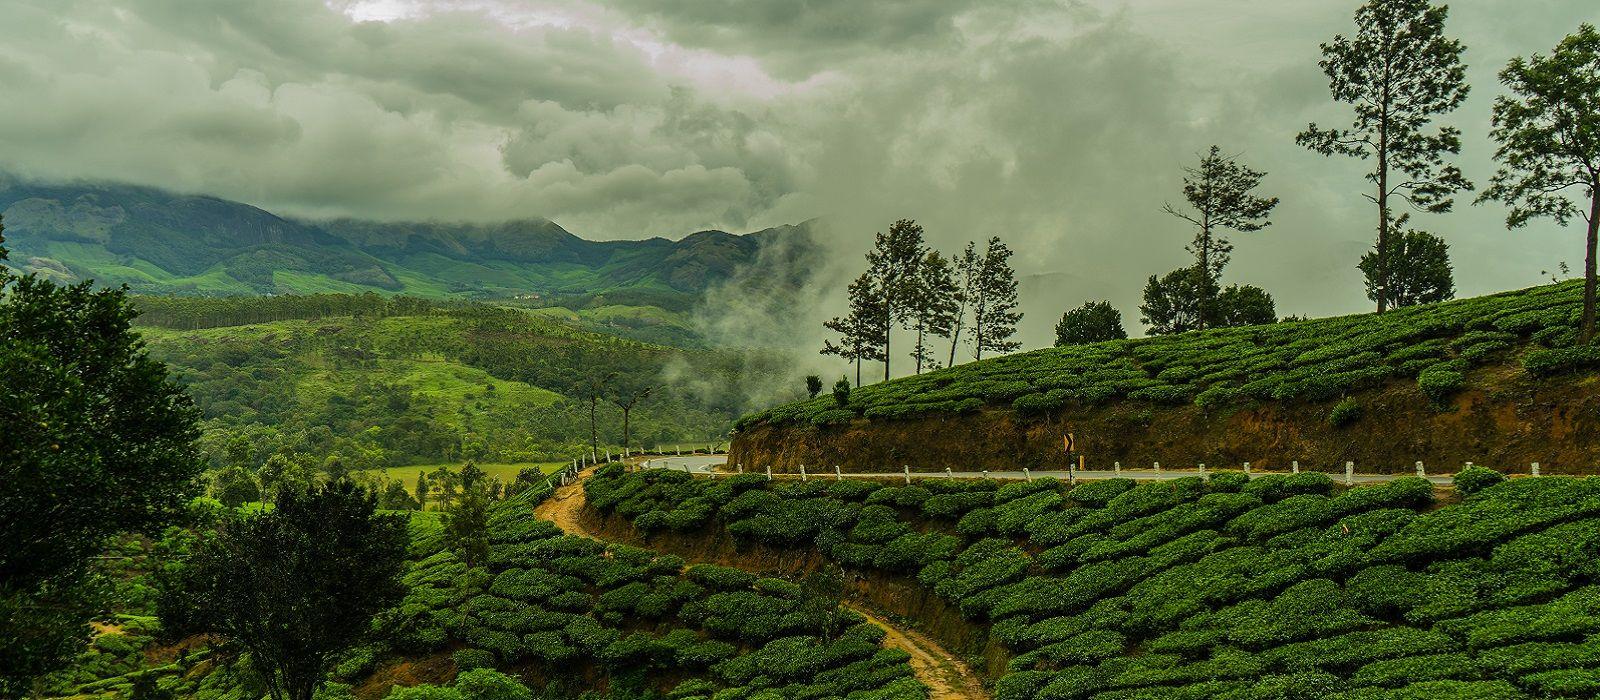 Backwaters to Beaches – Best of Kerala and Sri Lanka Tour Trip 3